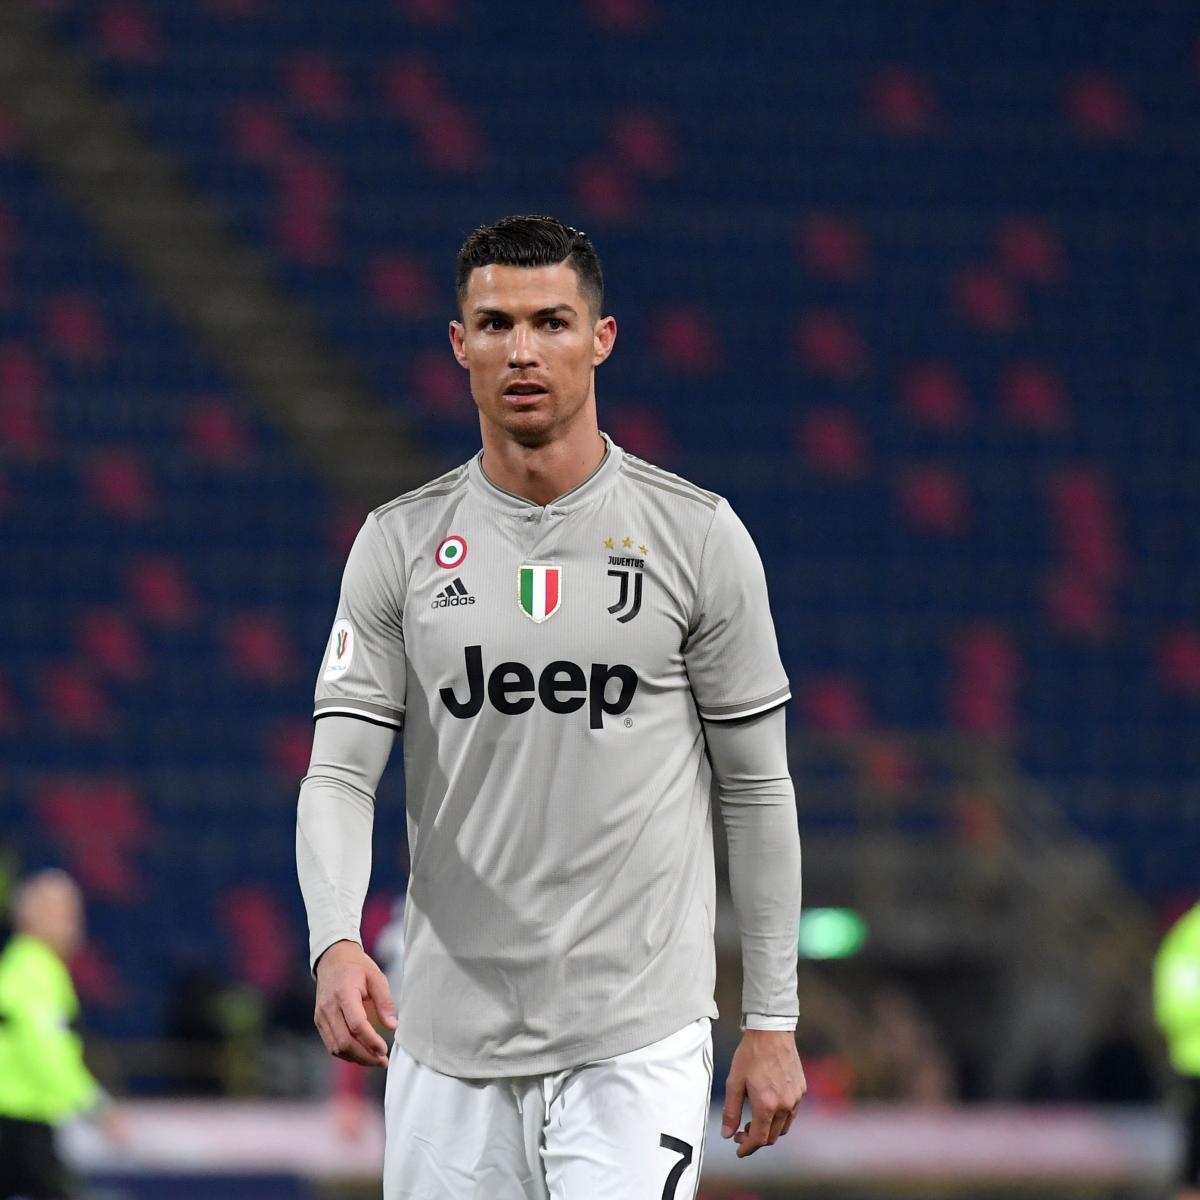 Juventus vs. AC Milan: 2018 Italian Super Cup TV Schedule, Live Stream